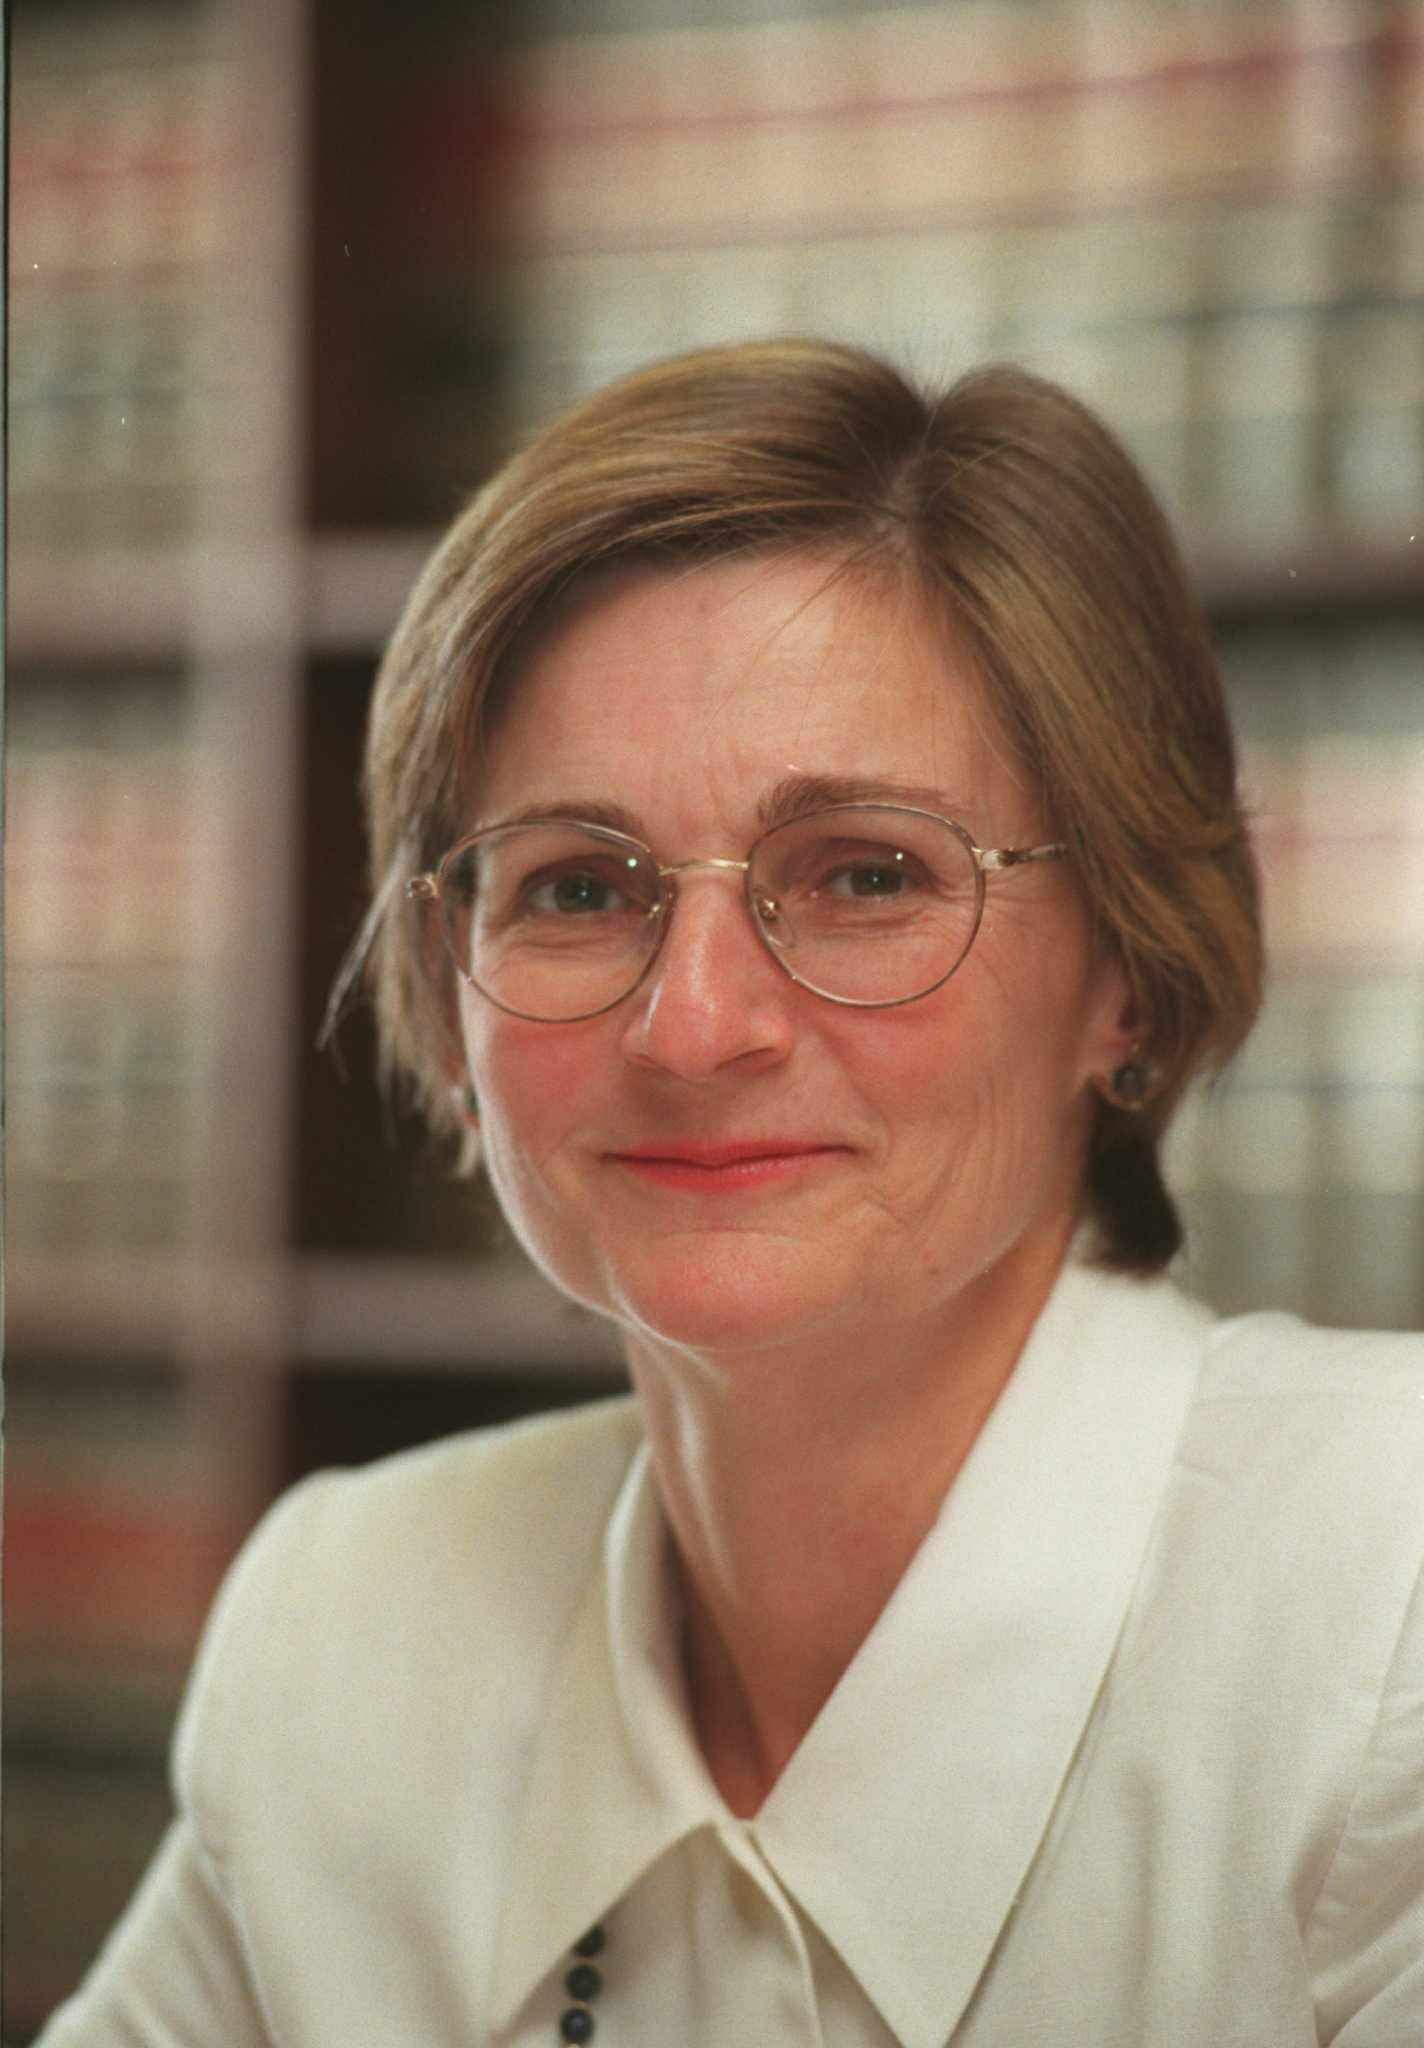 Judge Jones Outspoken But Are Remarks Improper Houston